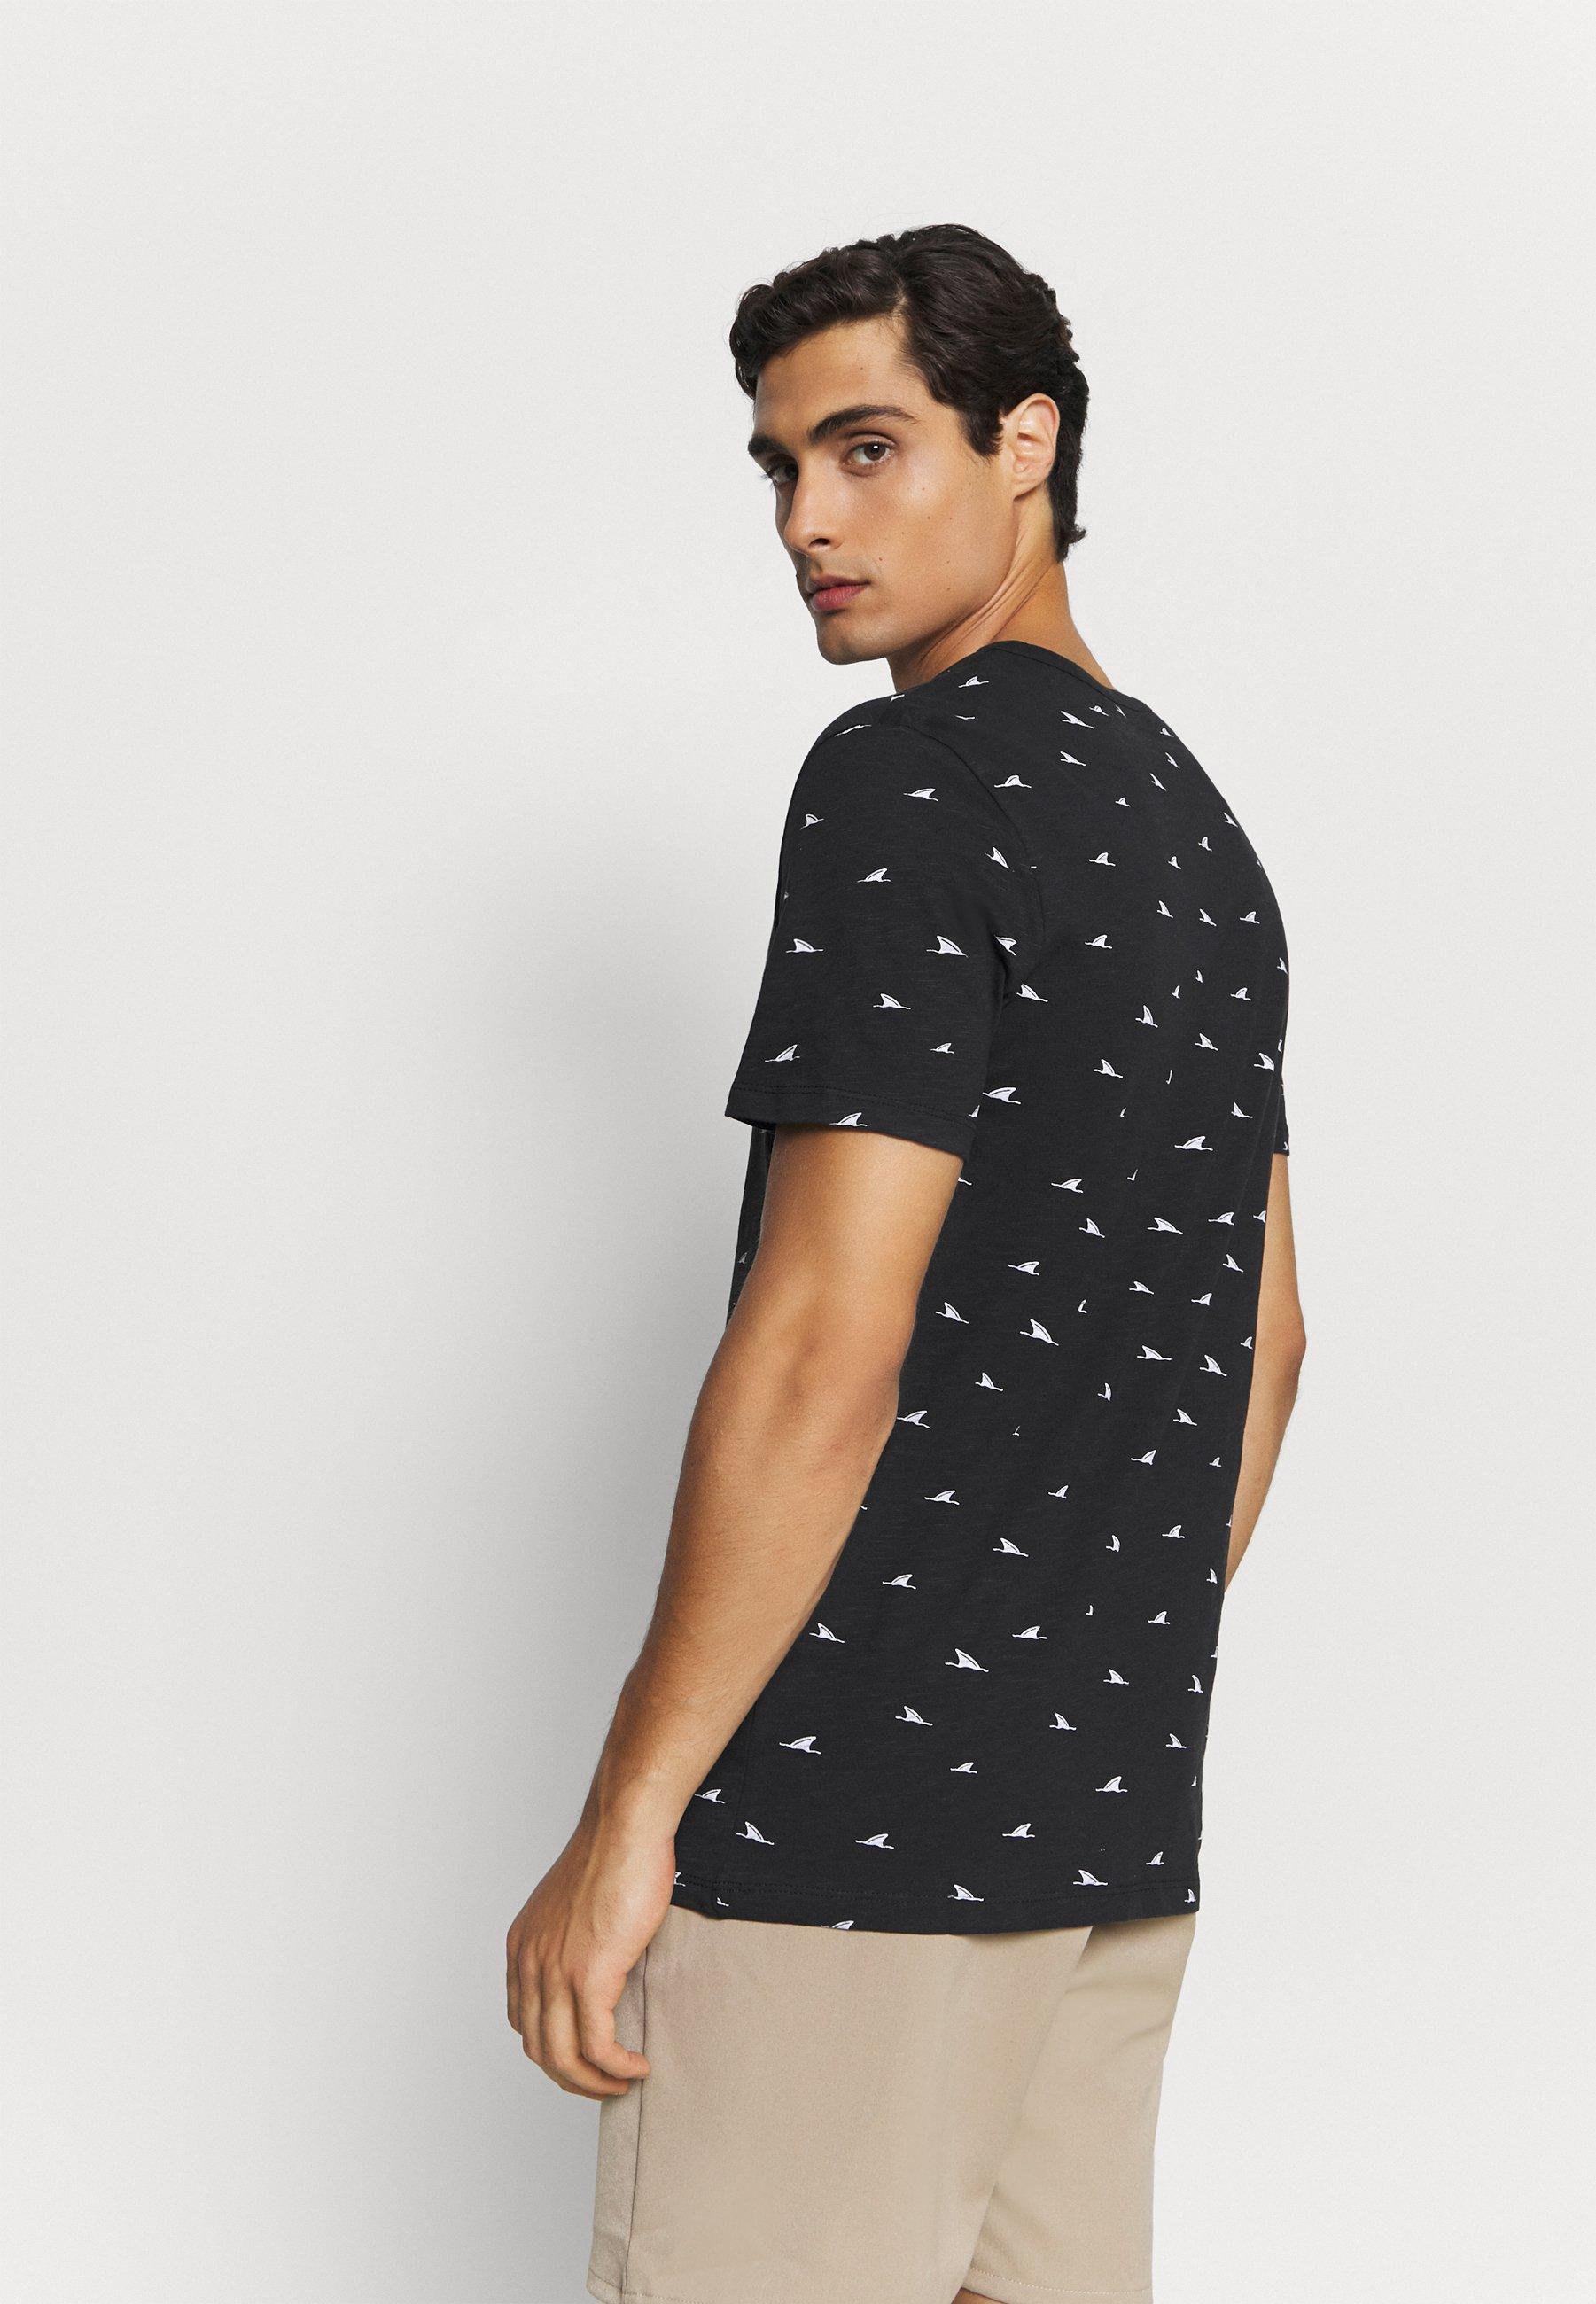 Pier One Print T-shirt - black WgwW6